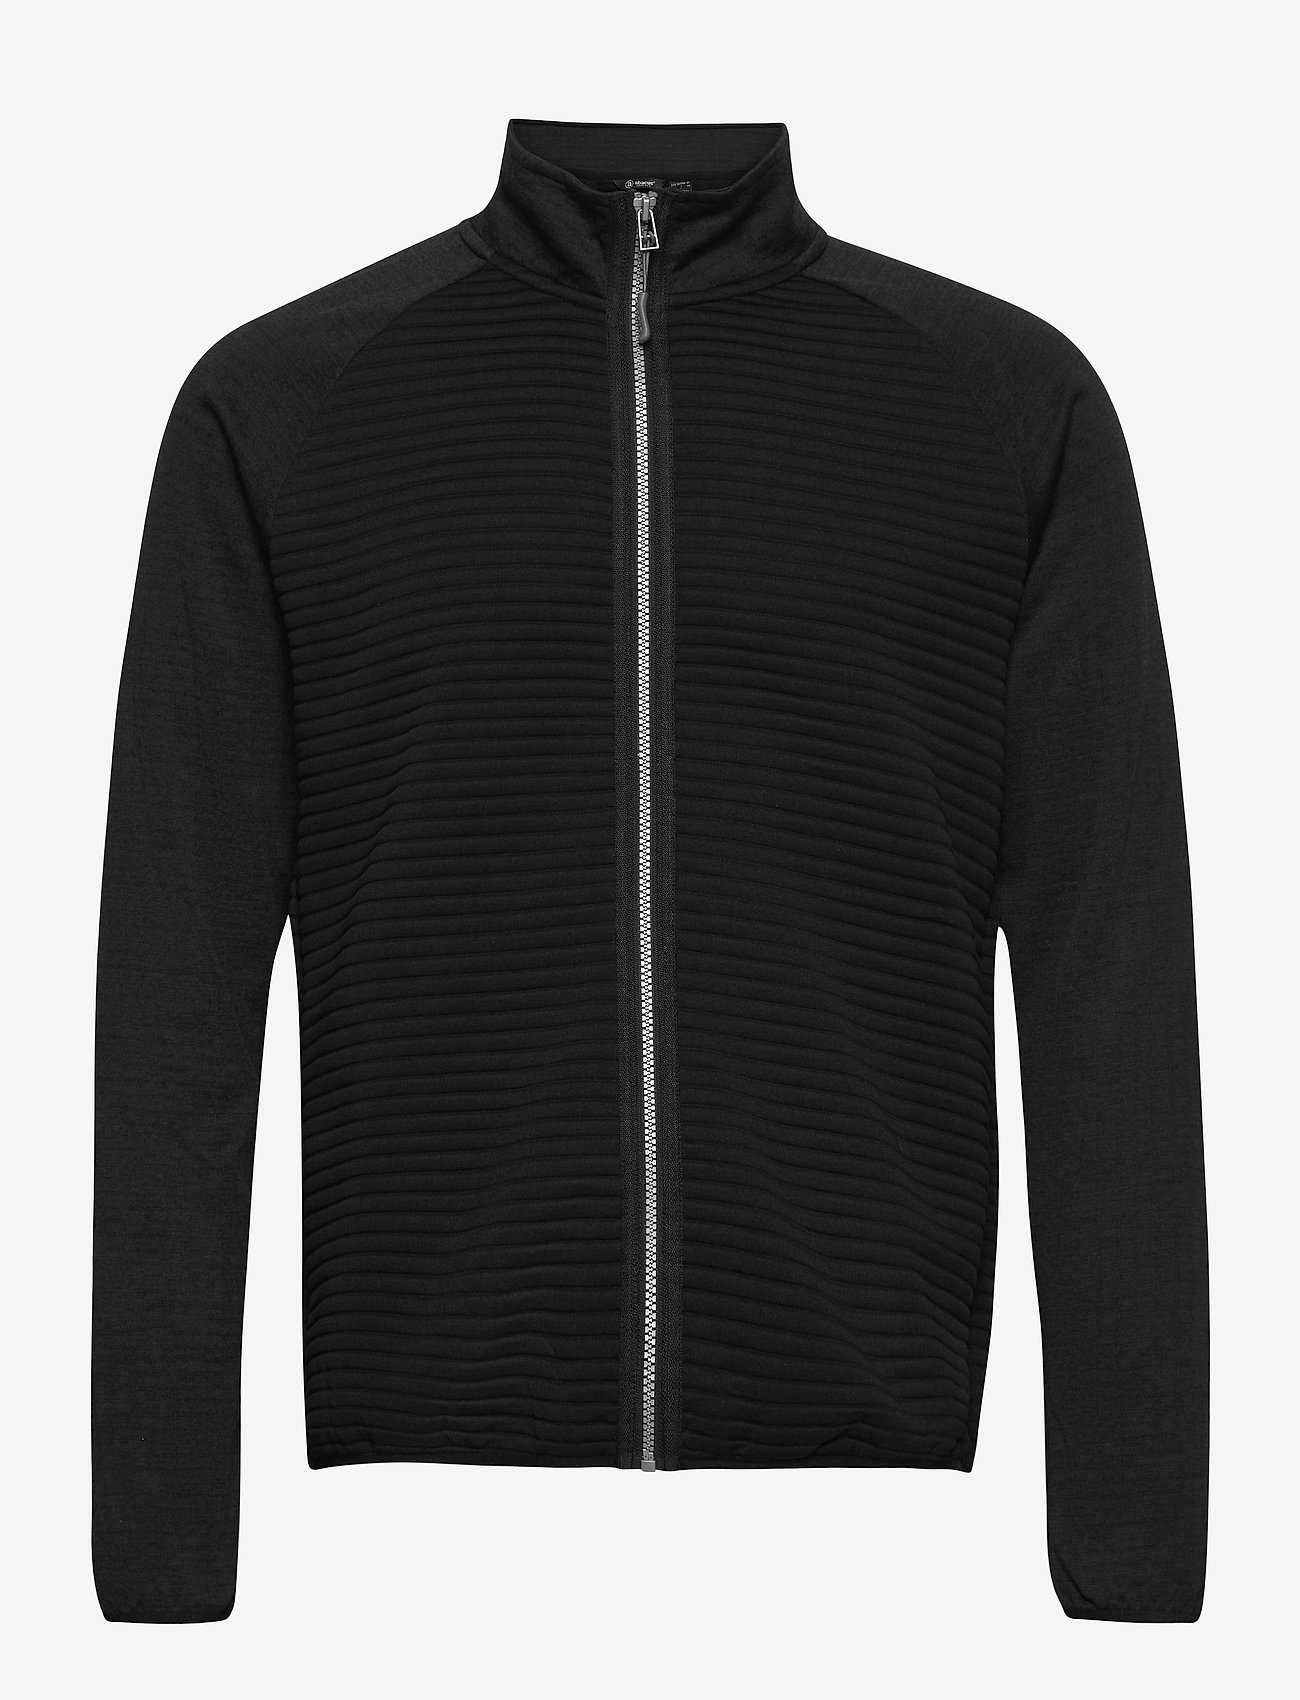 Abacus - Mens Turnberry 3D stripe fleece fullzip - golf jackets - black - 0